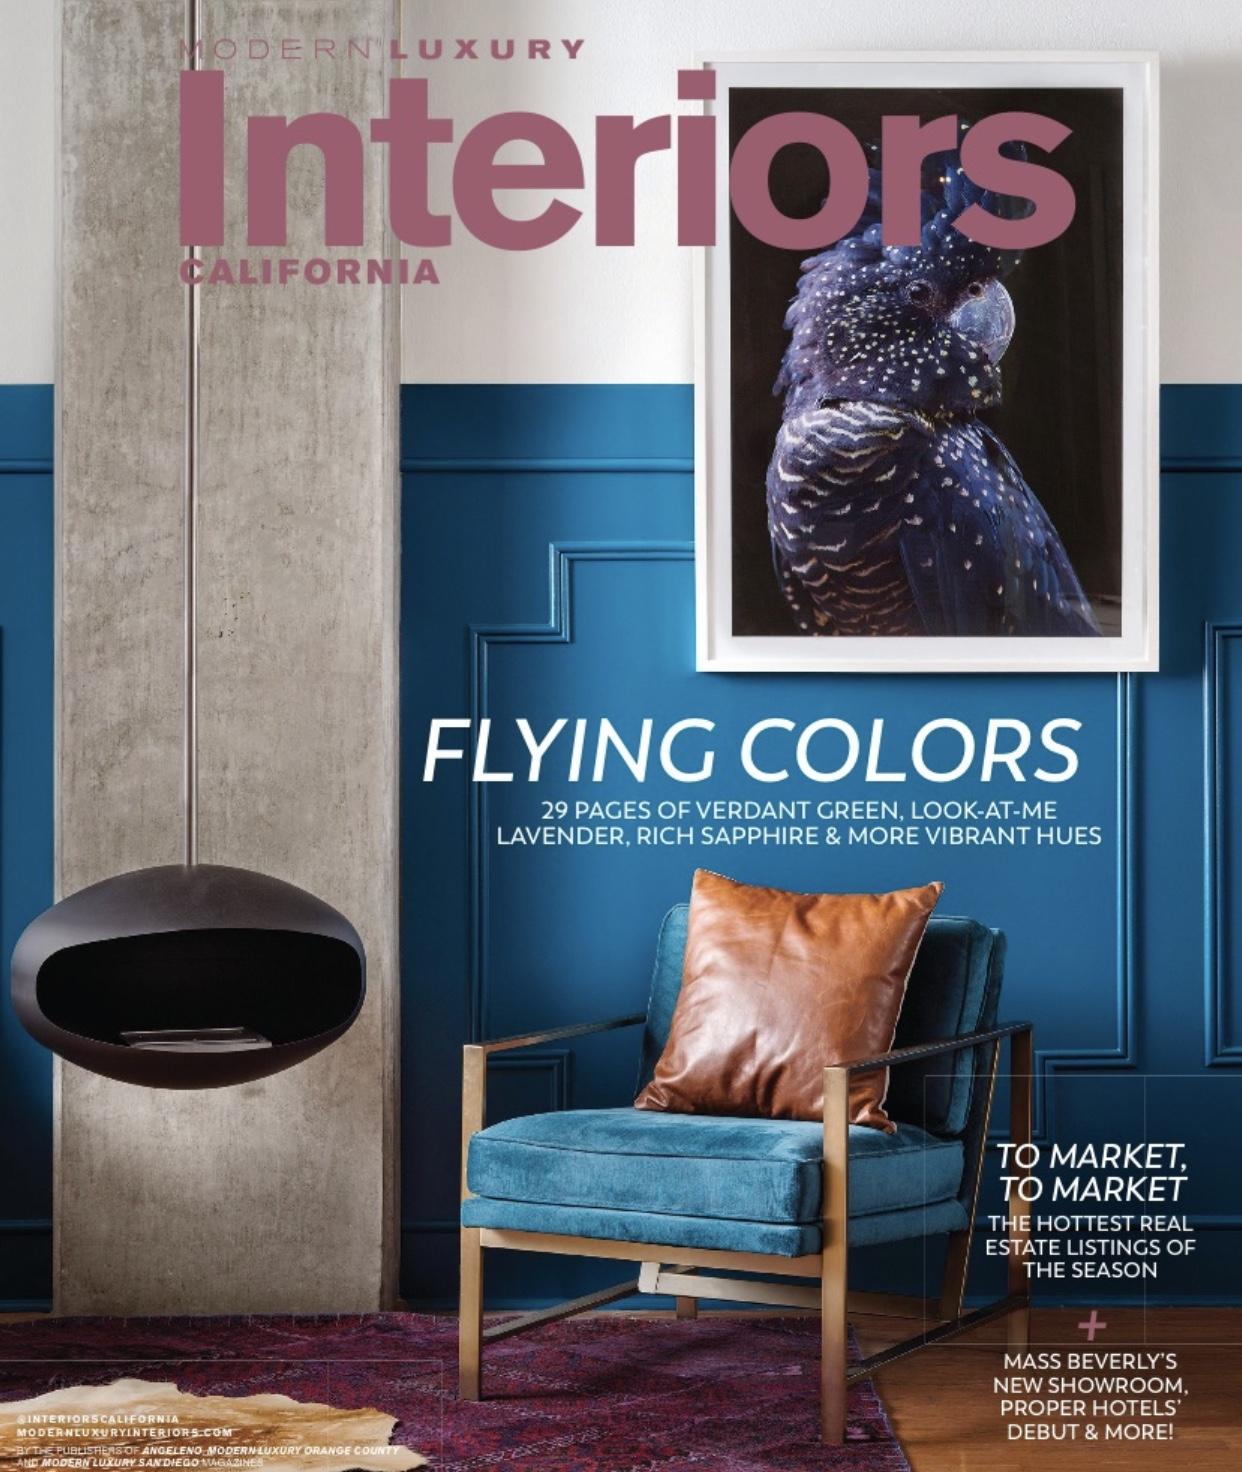 Modern Luxury Interiors California  - August 2019